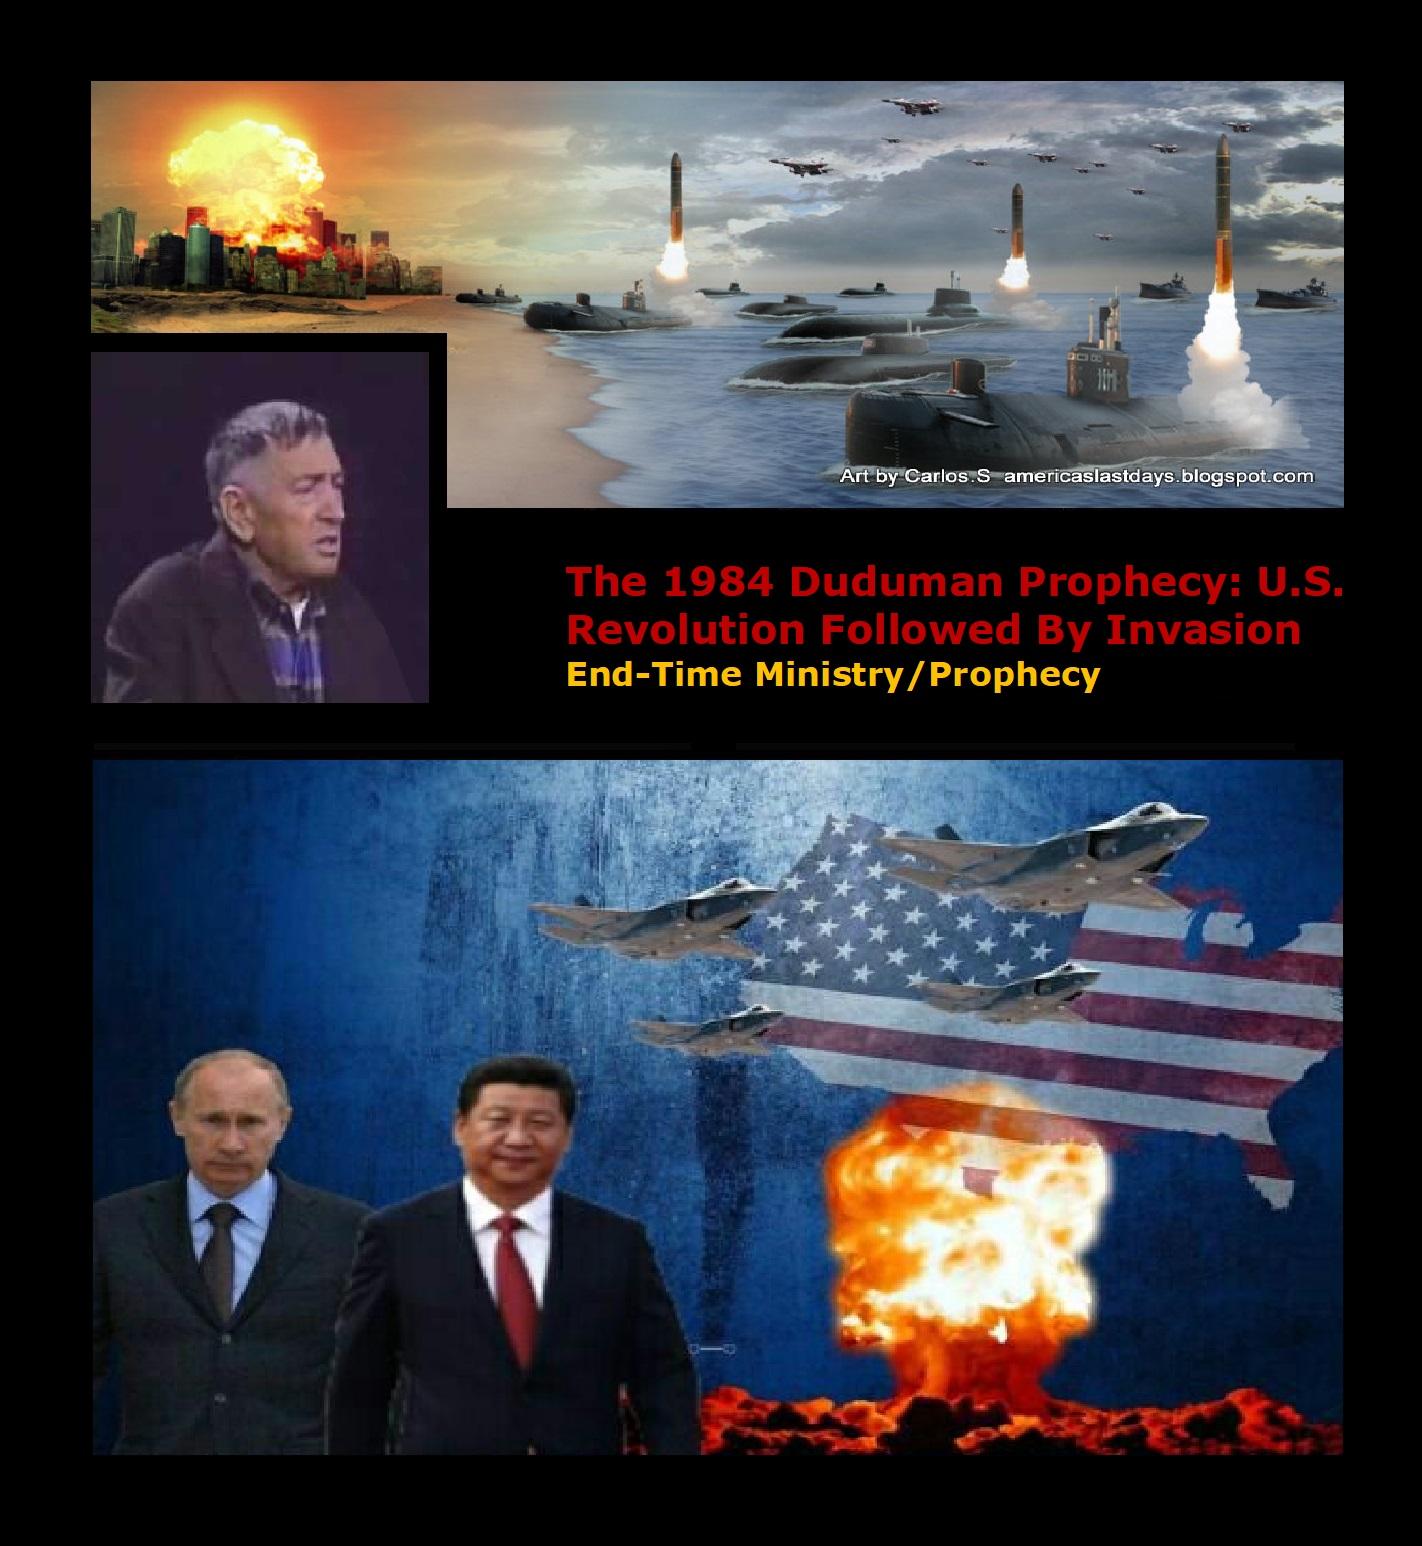 1984 Duduman Prophecy